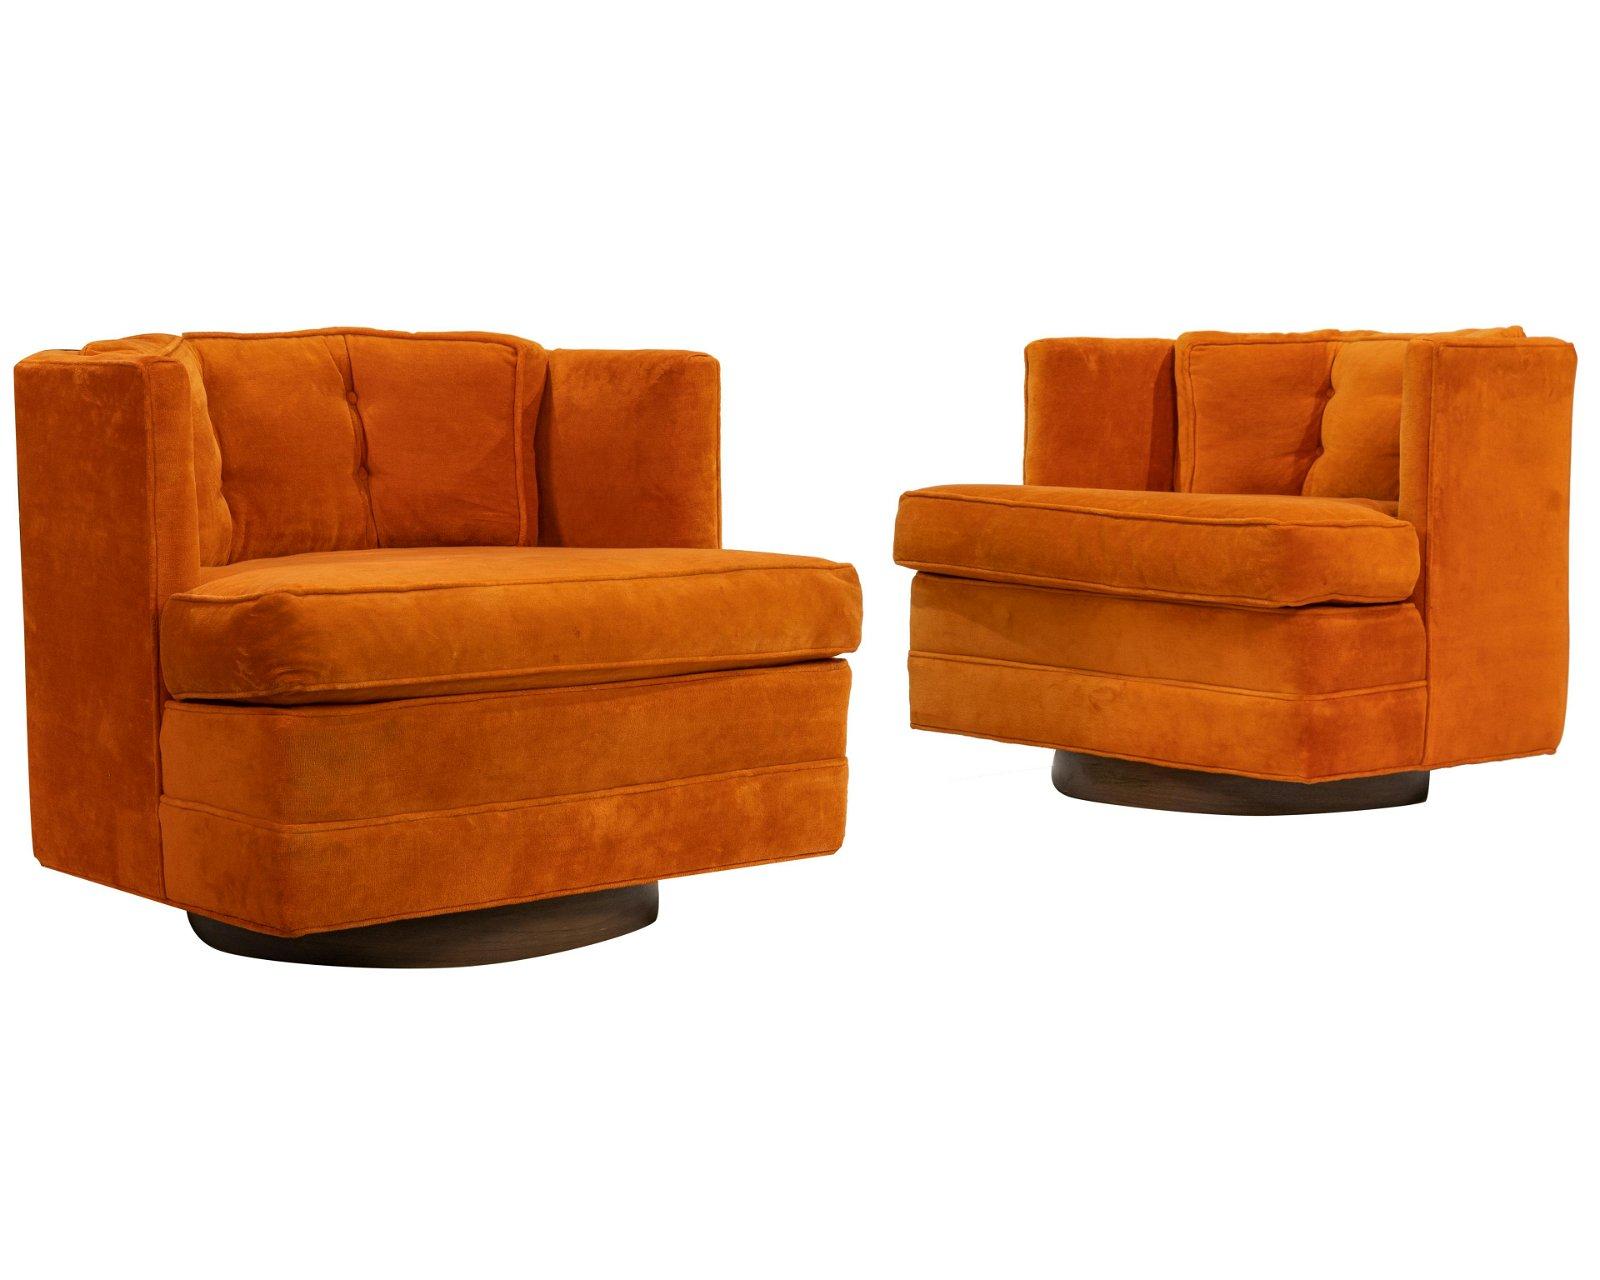 Maurice Villency - Swivel Chairs